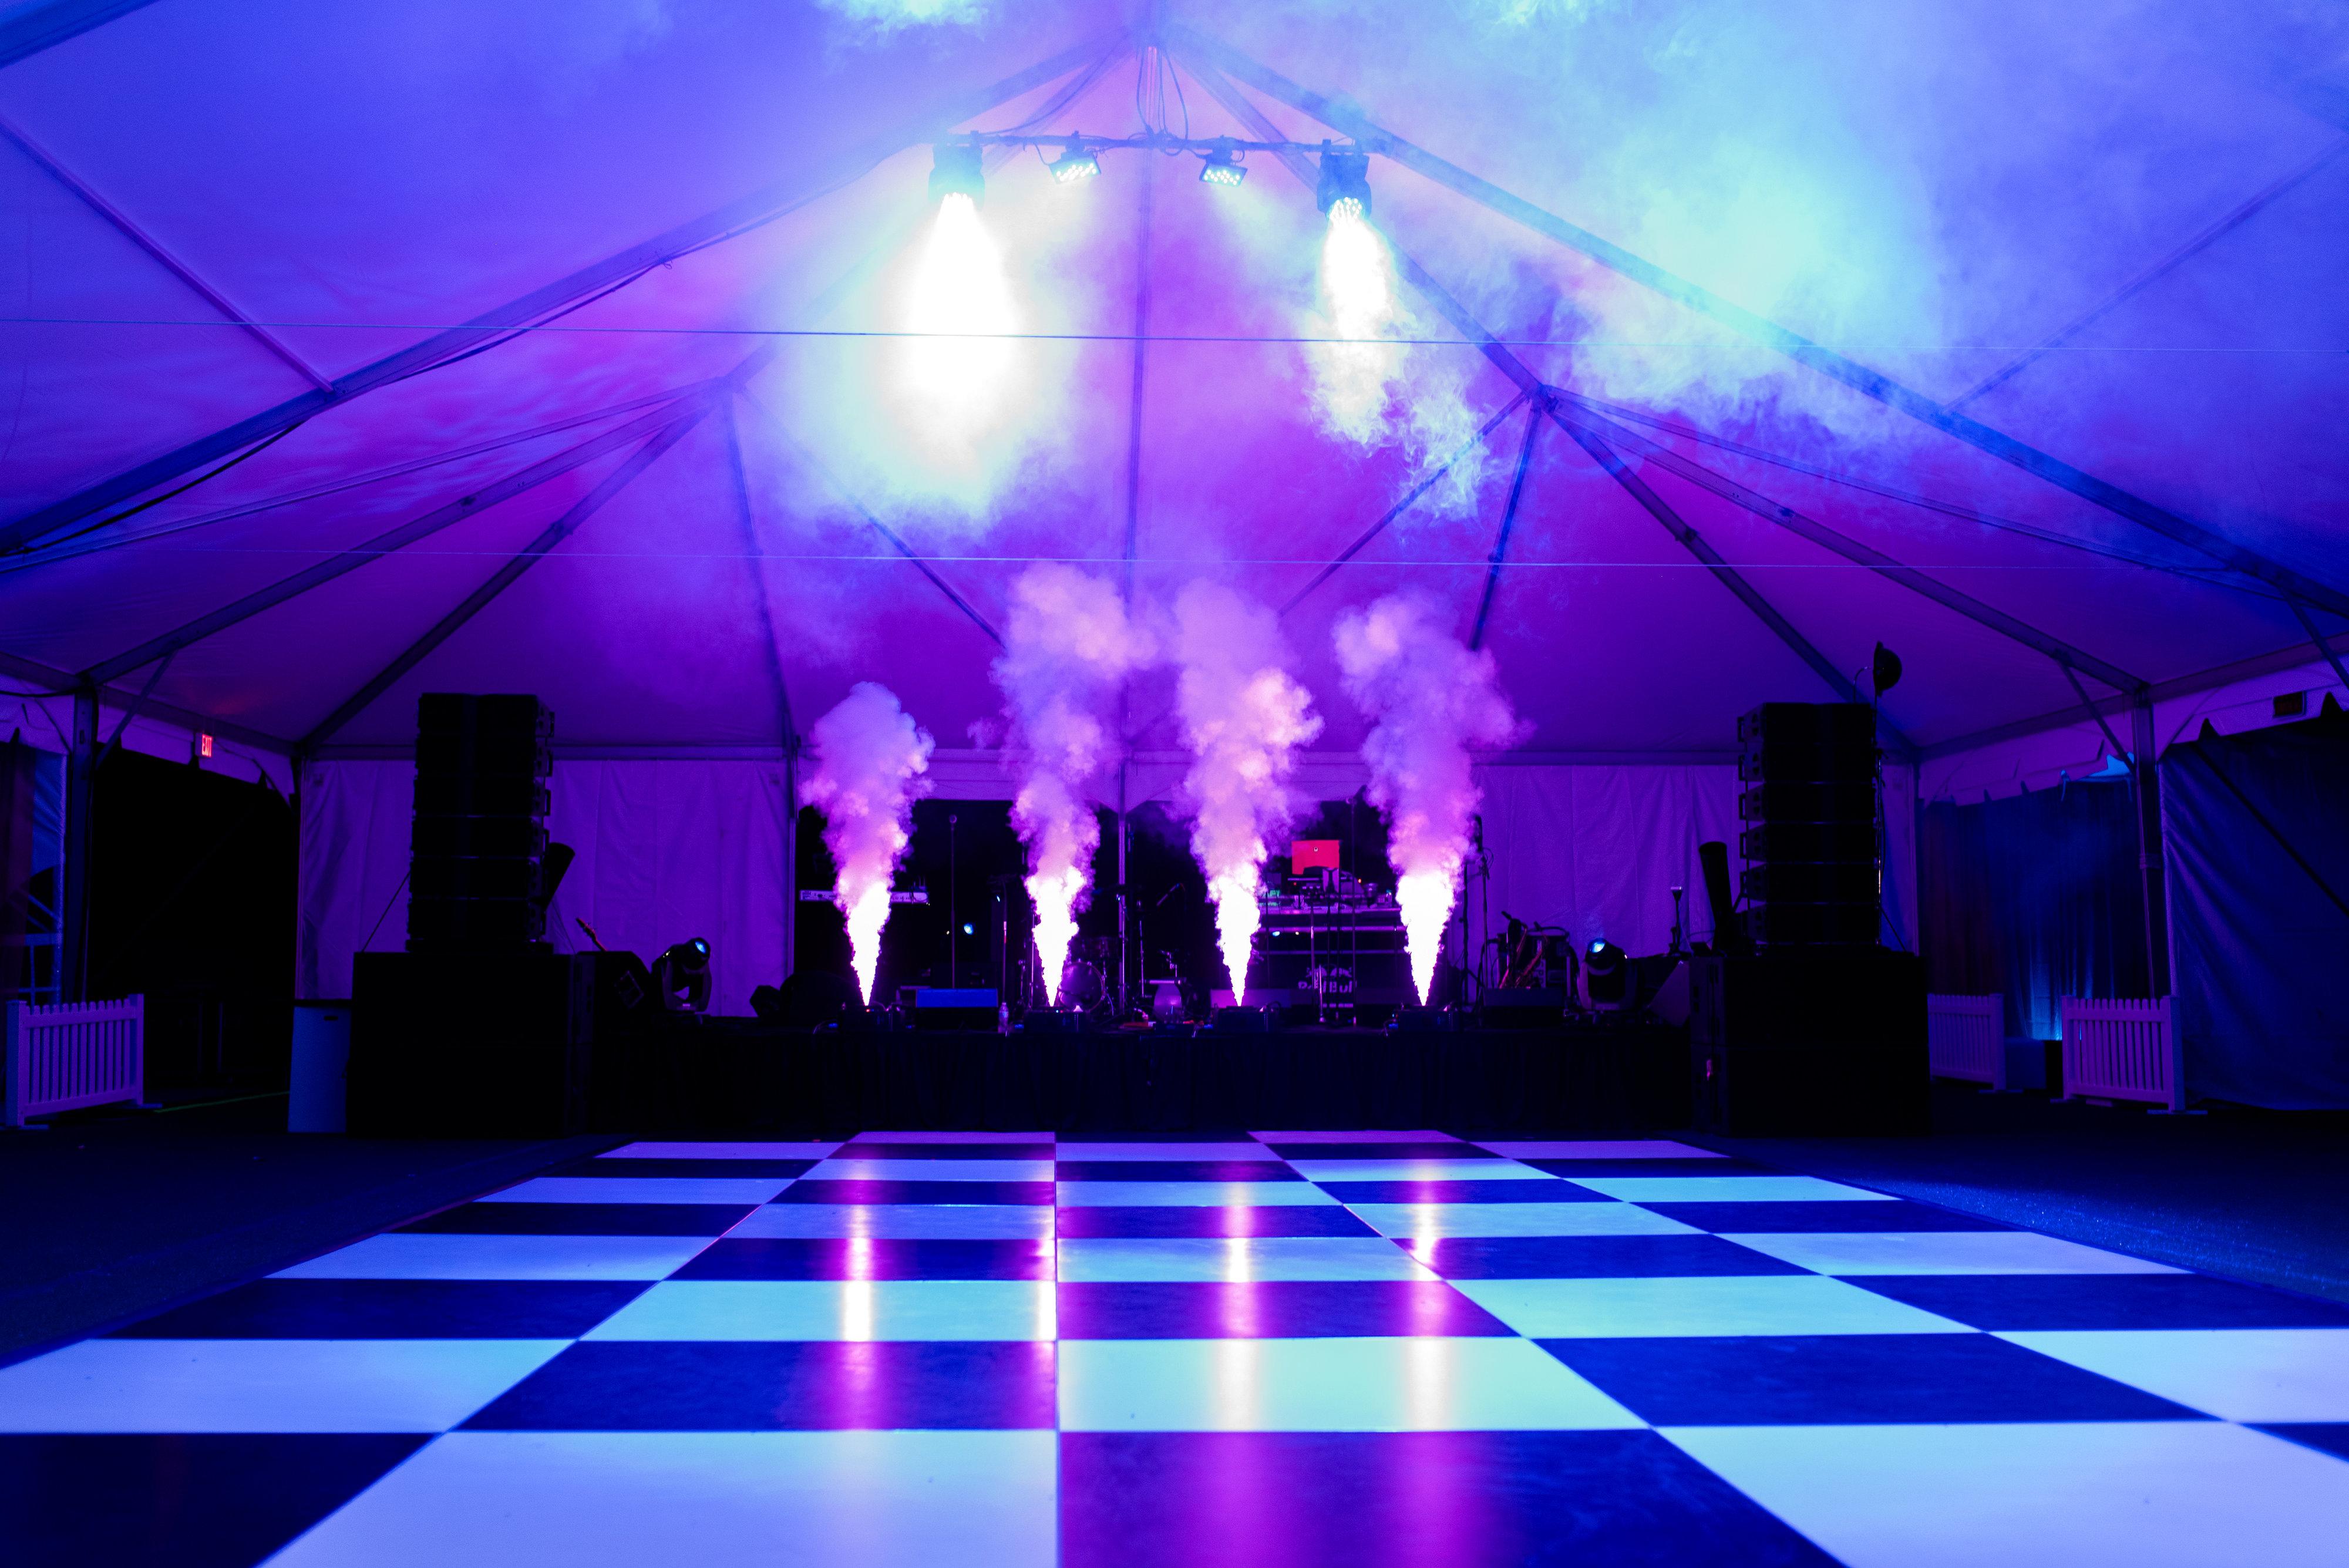 Fog-Rooftop Eve 2015